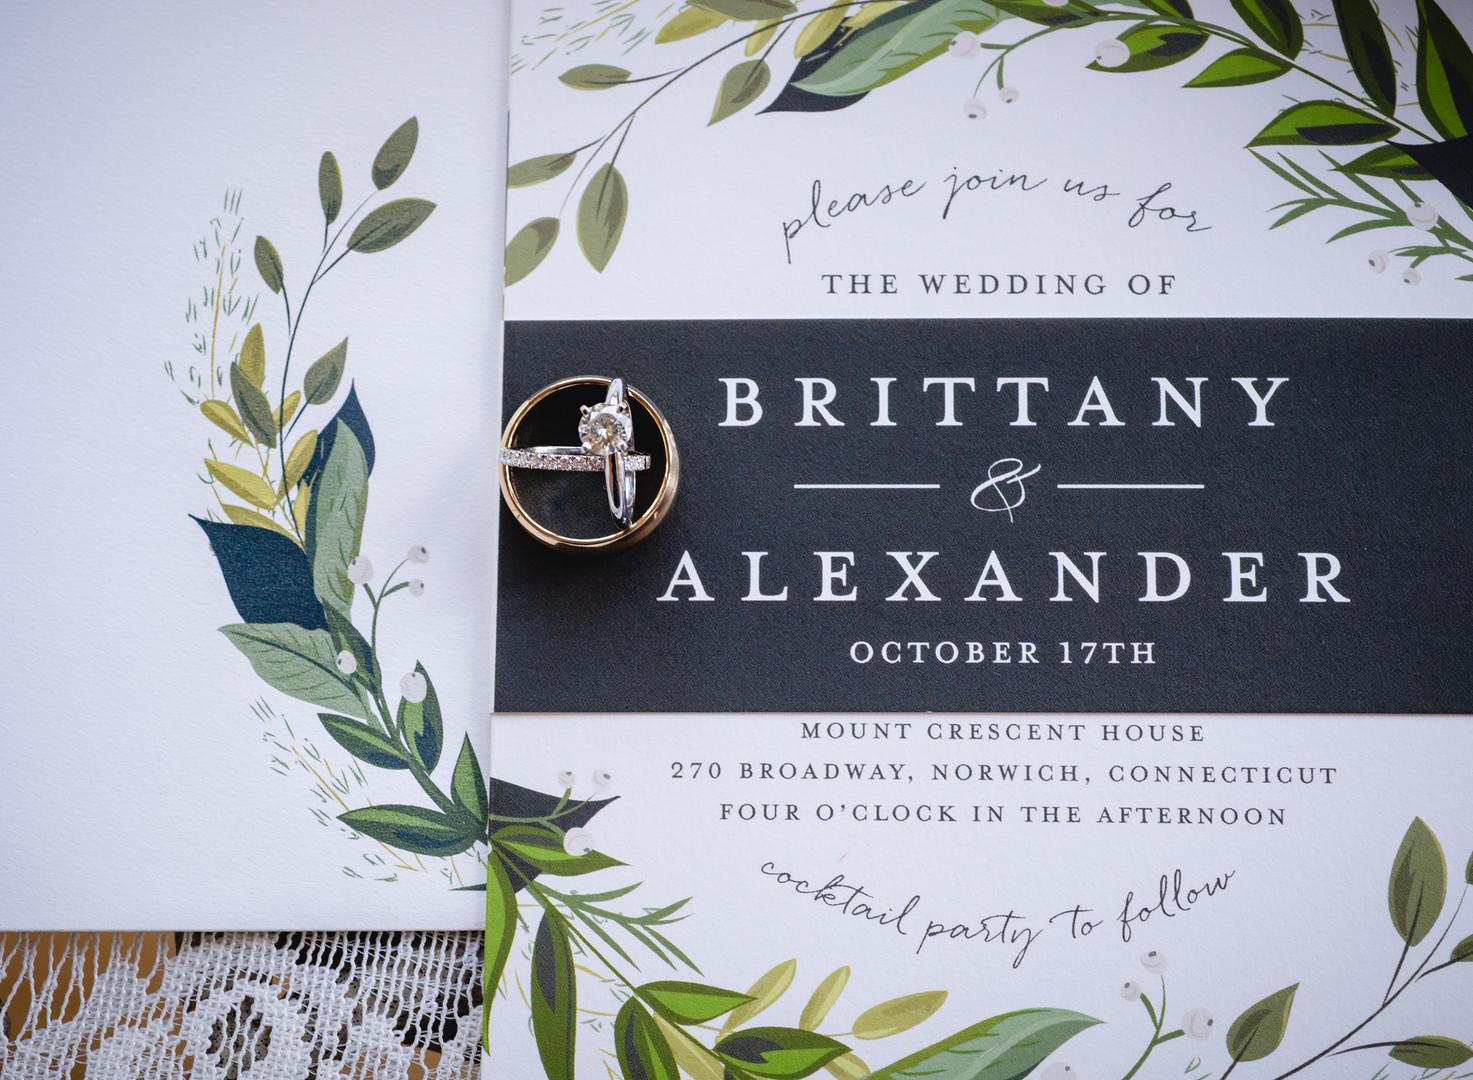 wedding rings on invitation suite